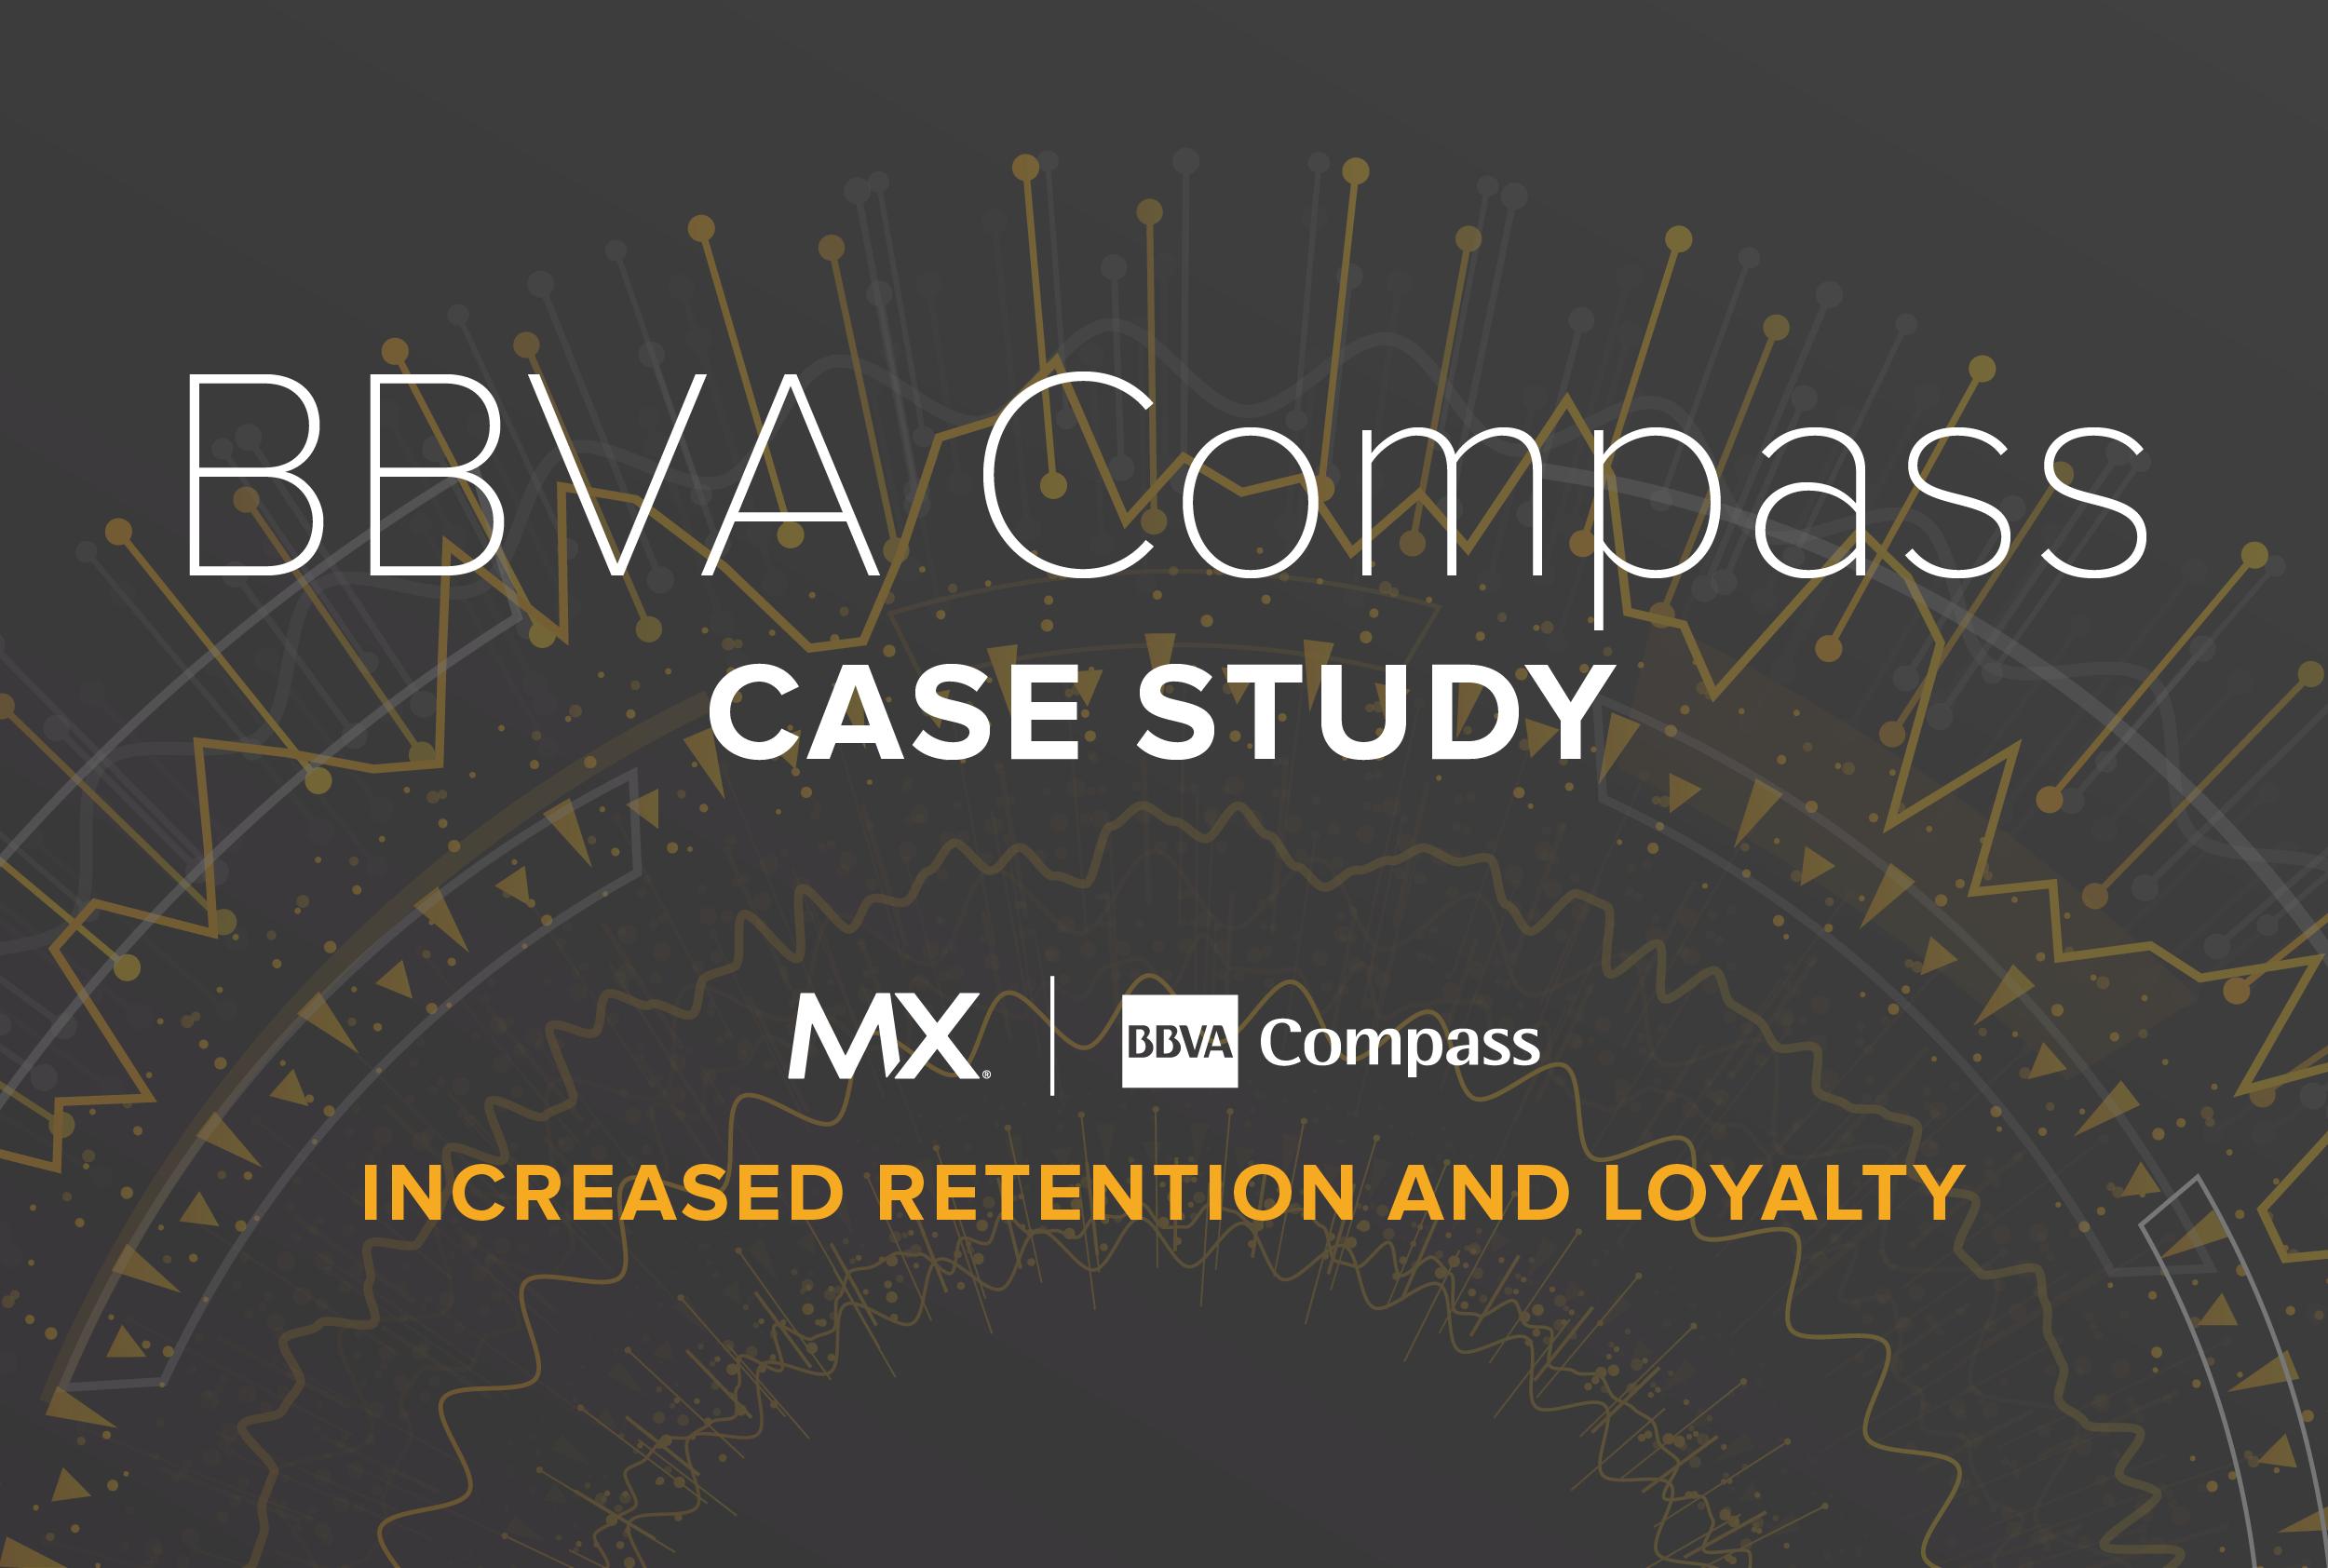 Case Study: BBVA Compass